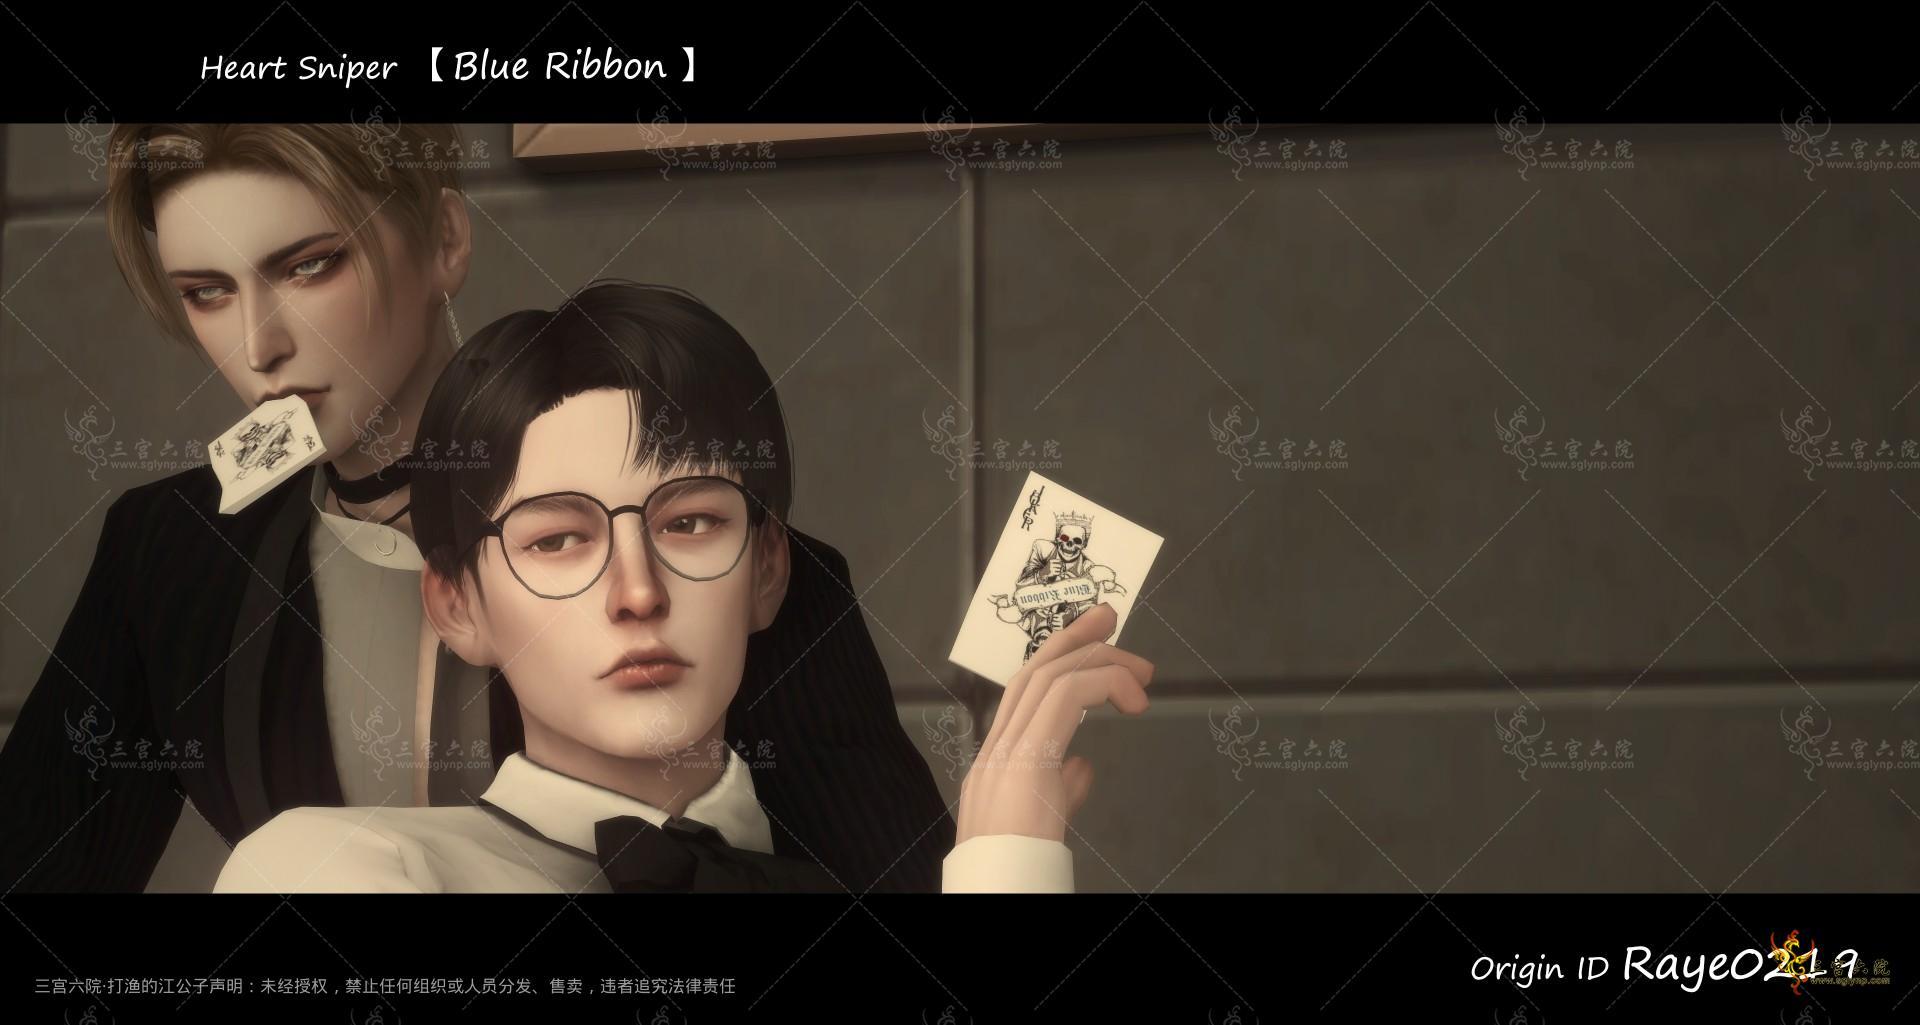 HS III [BLUE RIBBON] 07.png